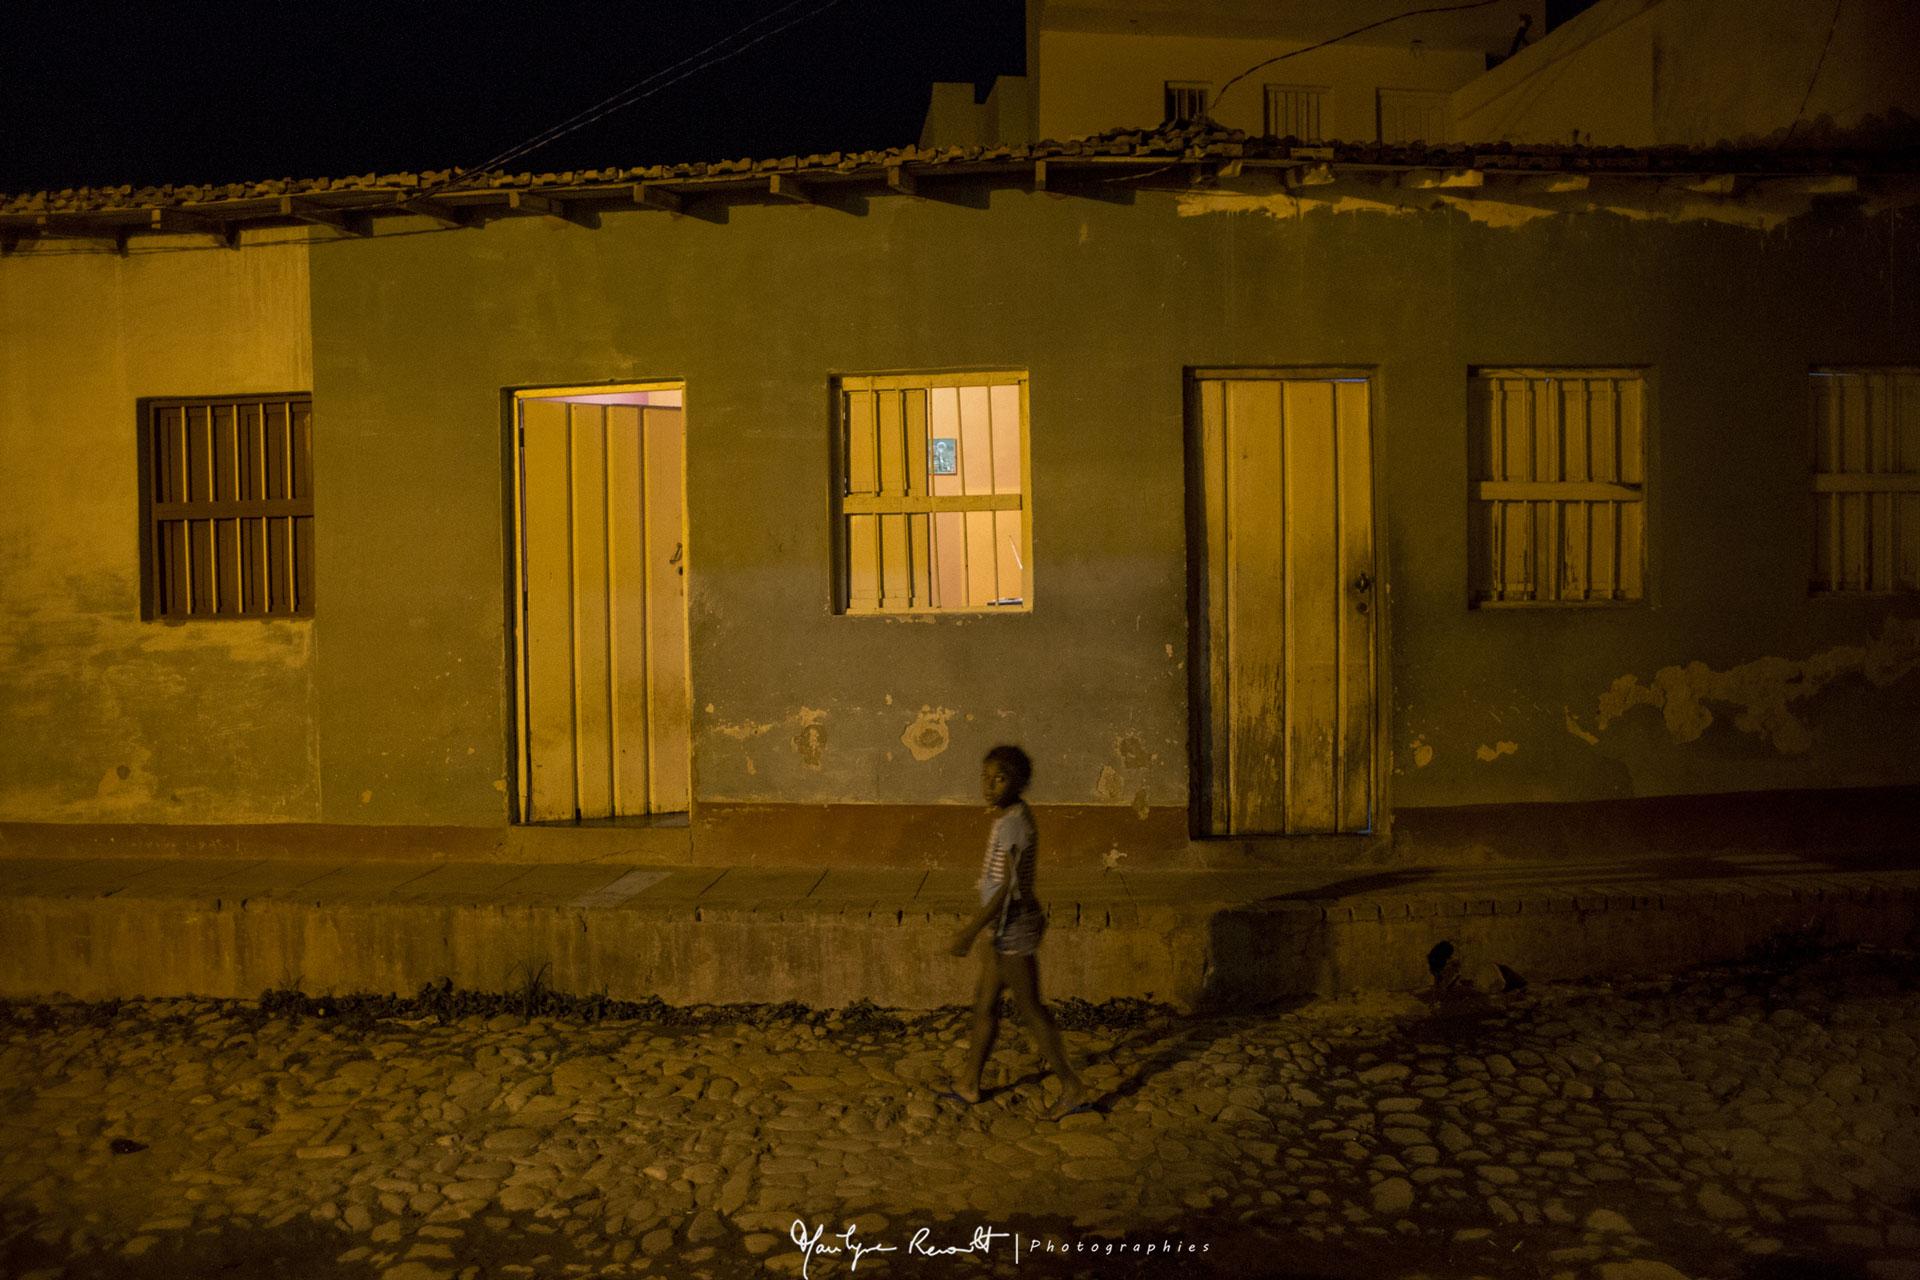 05-Cuba-marilyne renoult